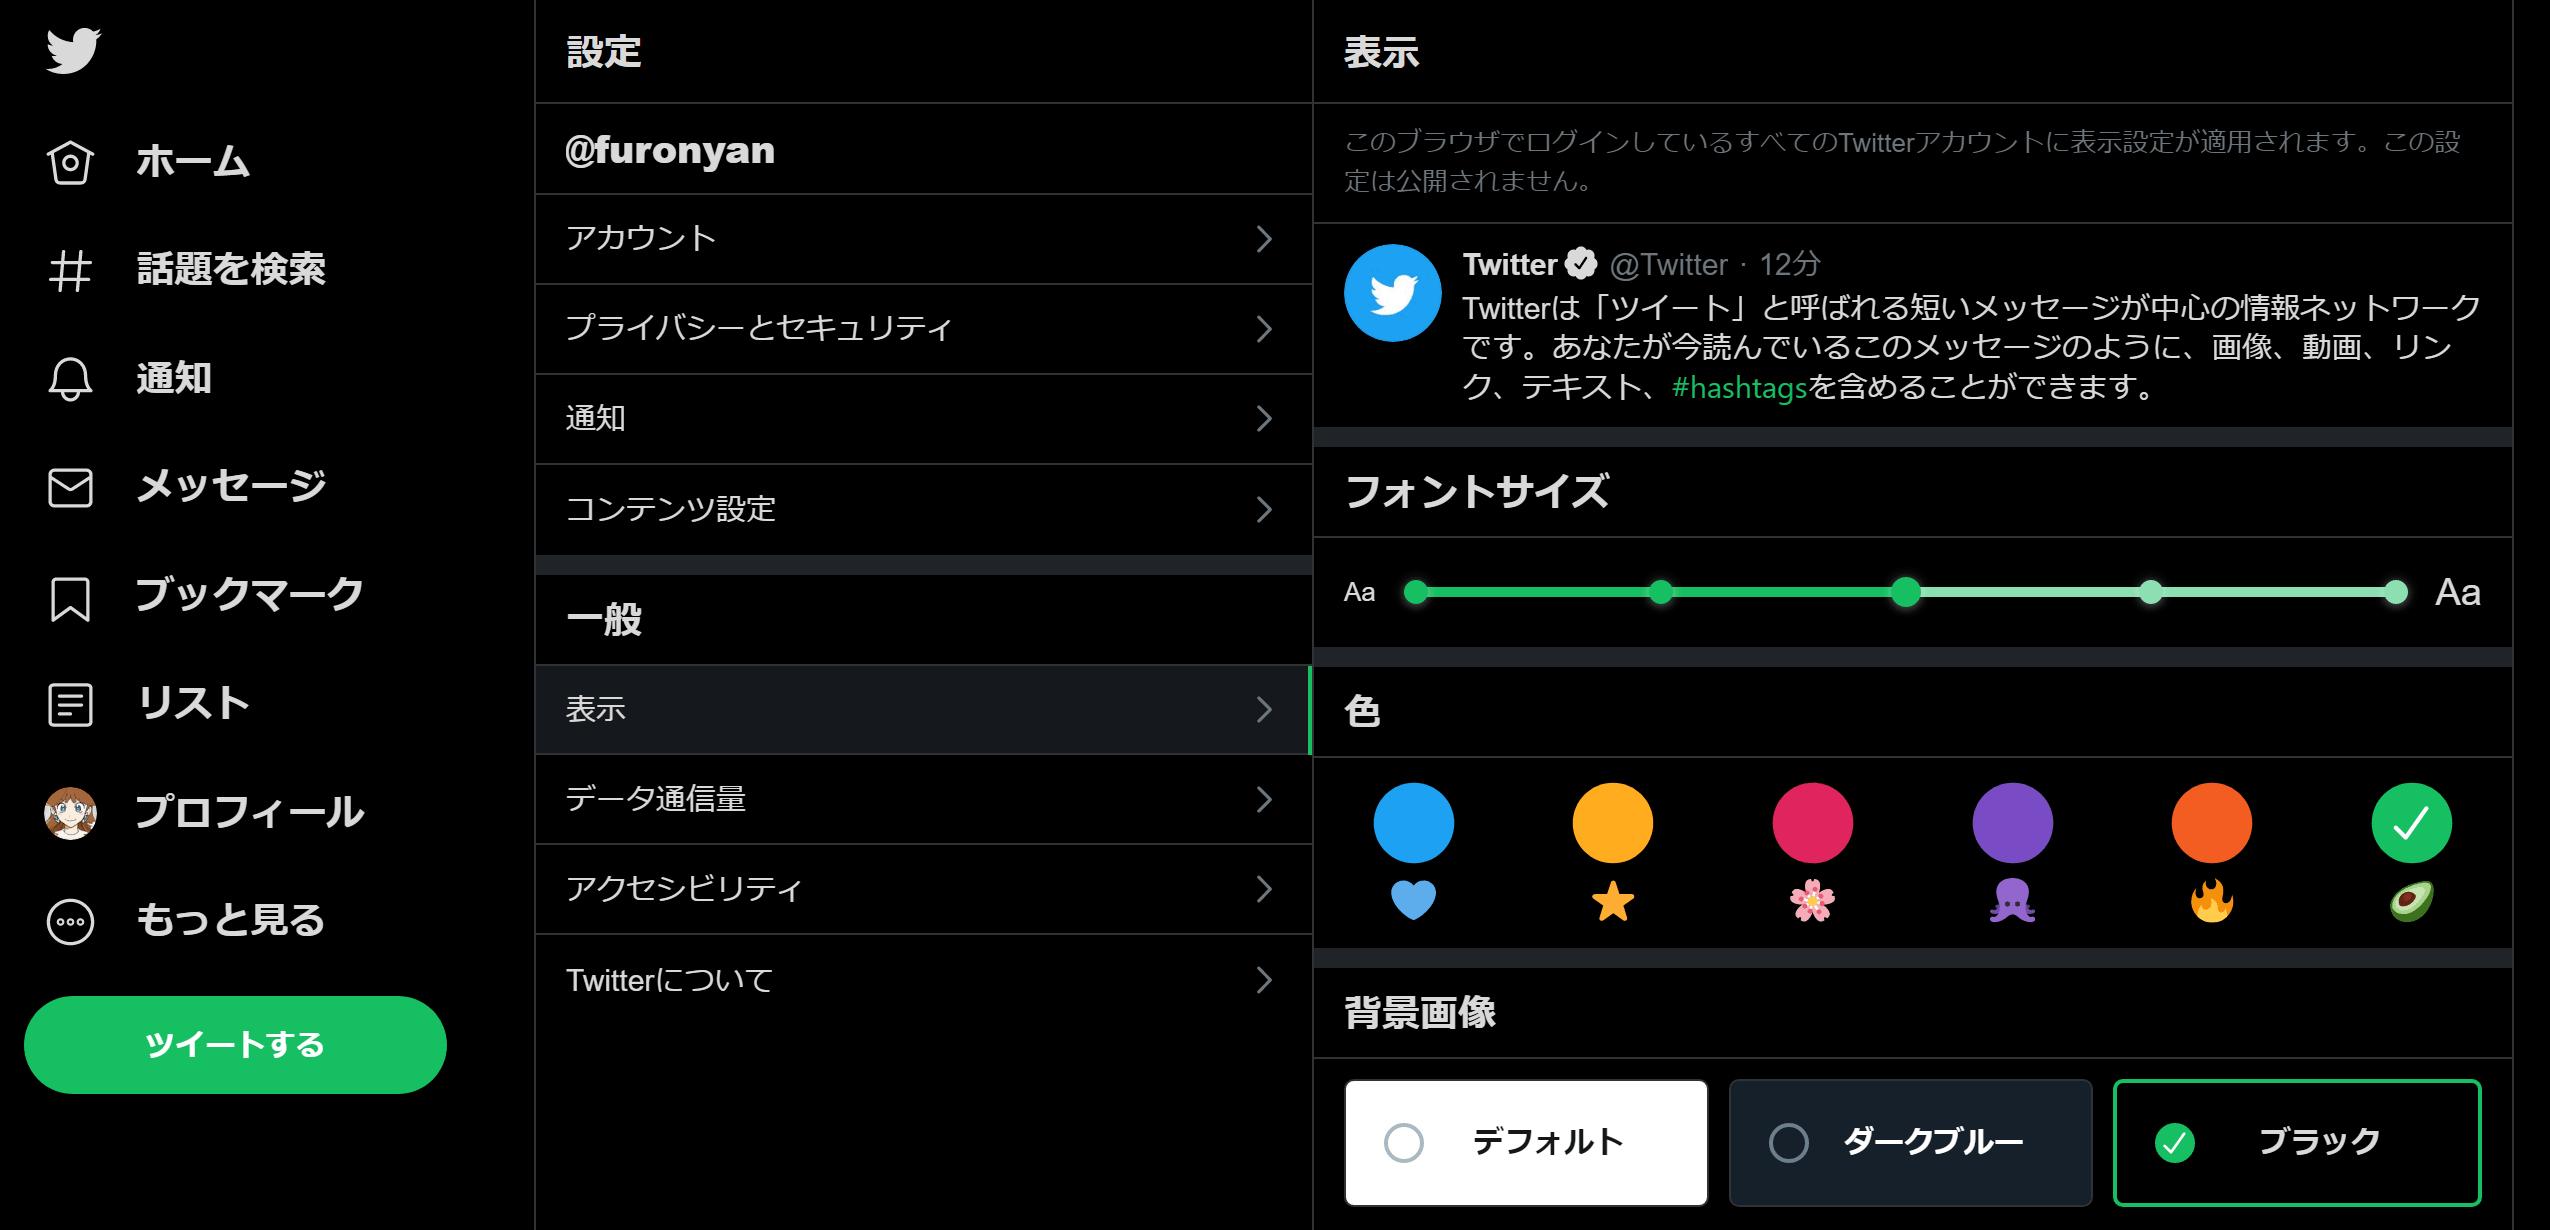 Twitterの背景色表示設定、ブラック背景モード